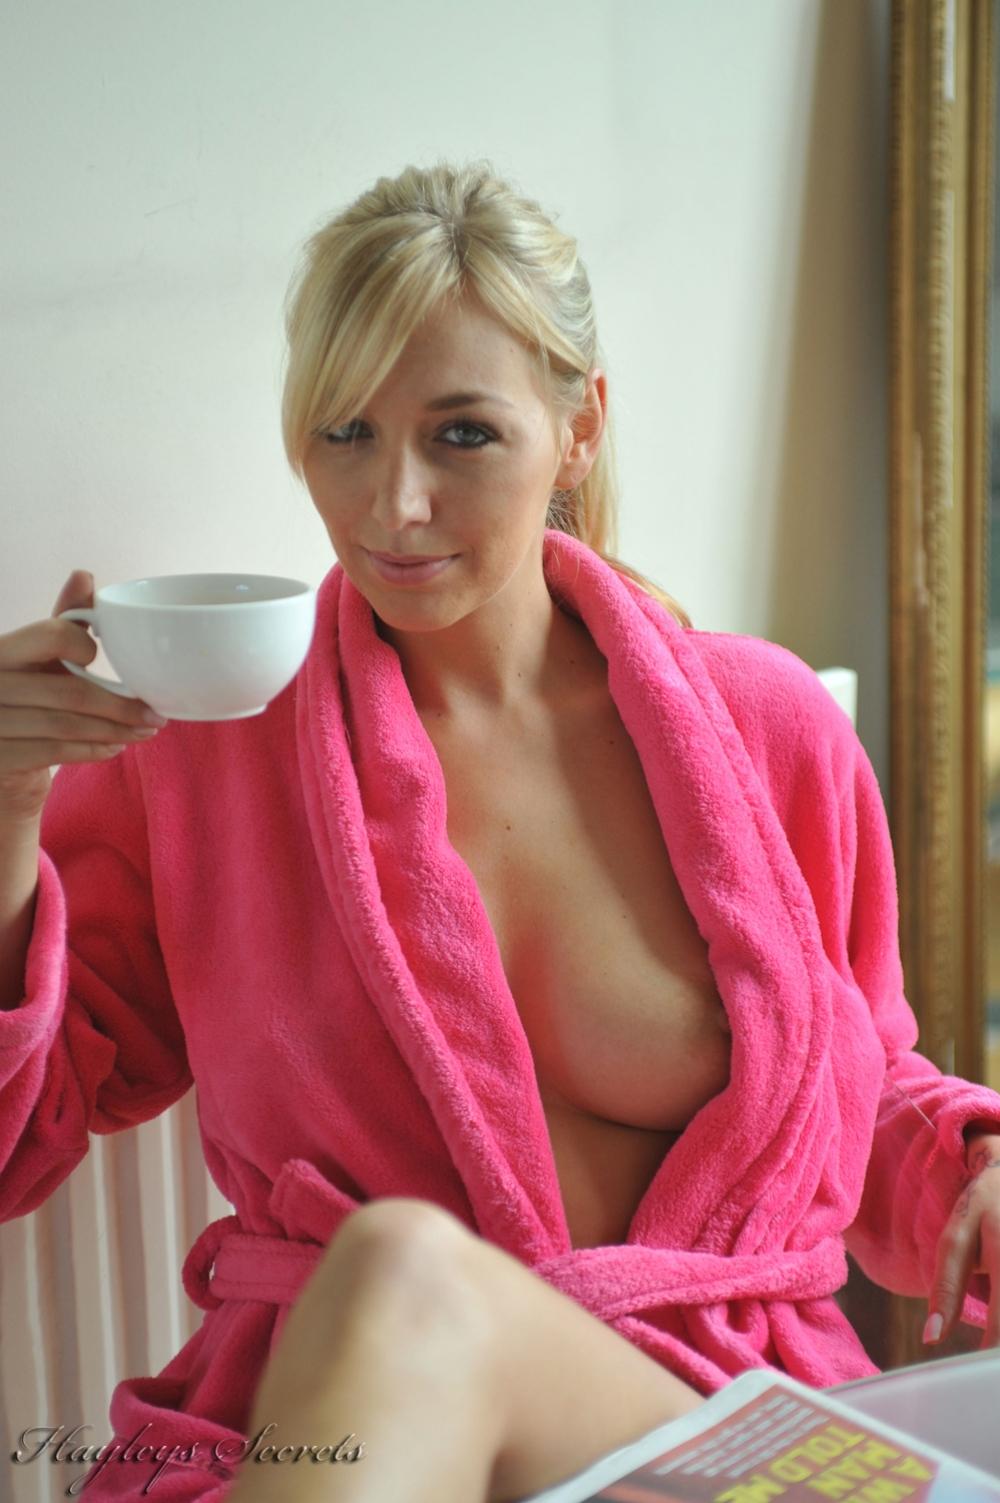 hayley marie nude öffnen robe